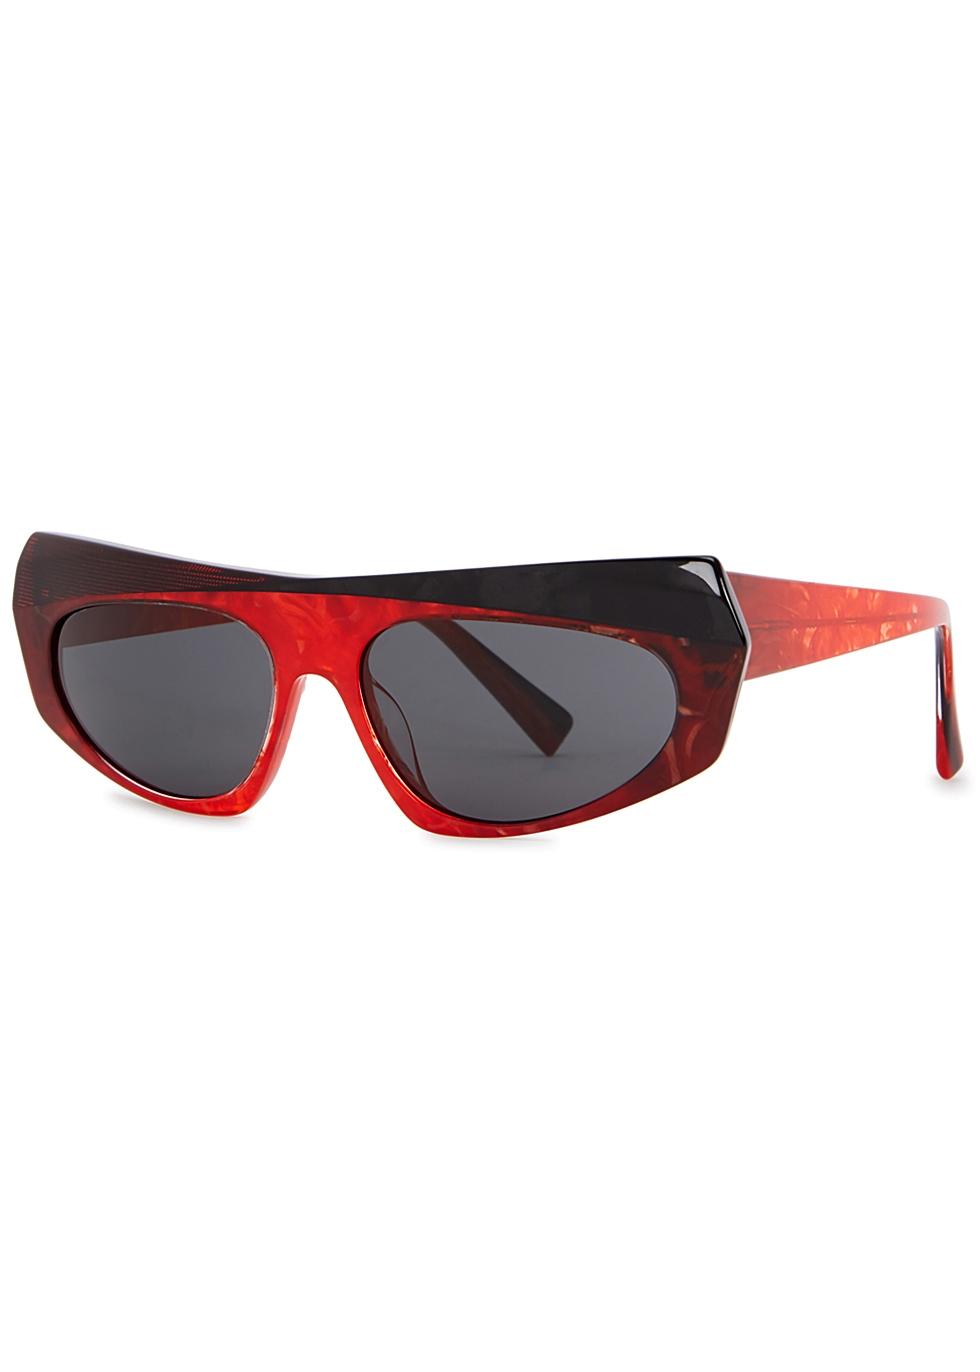 ALAIN MIKLI Pose Red Marbled Sunglasses